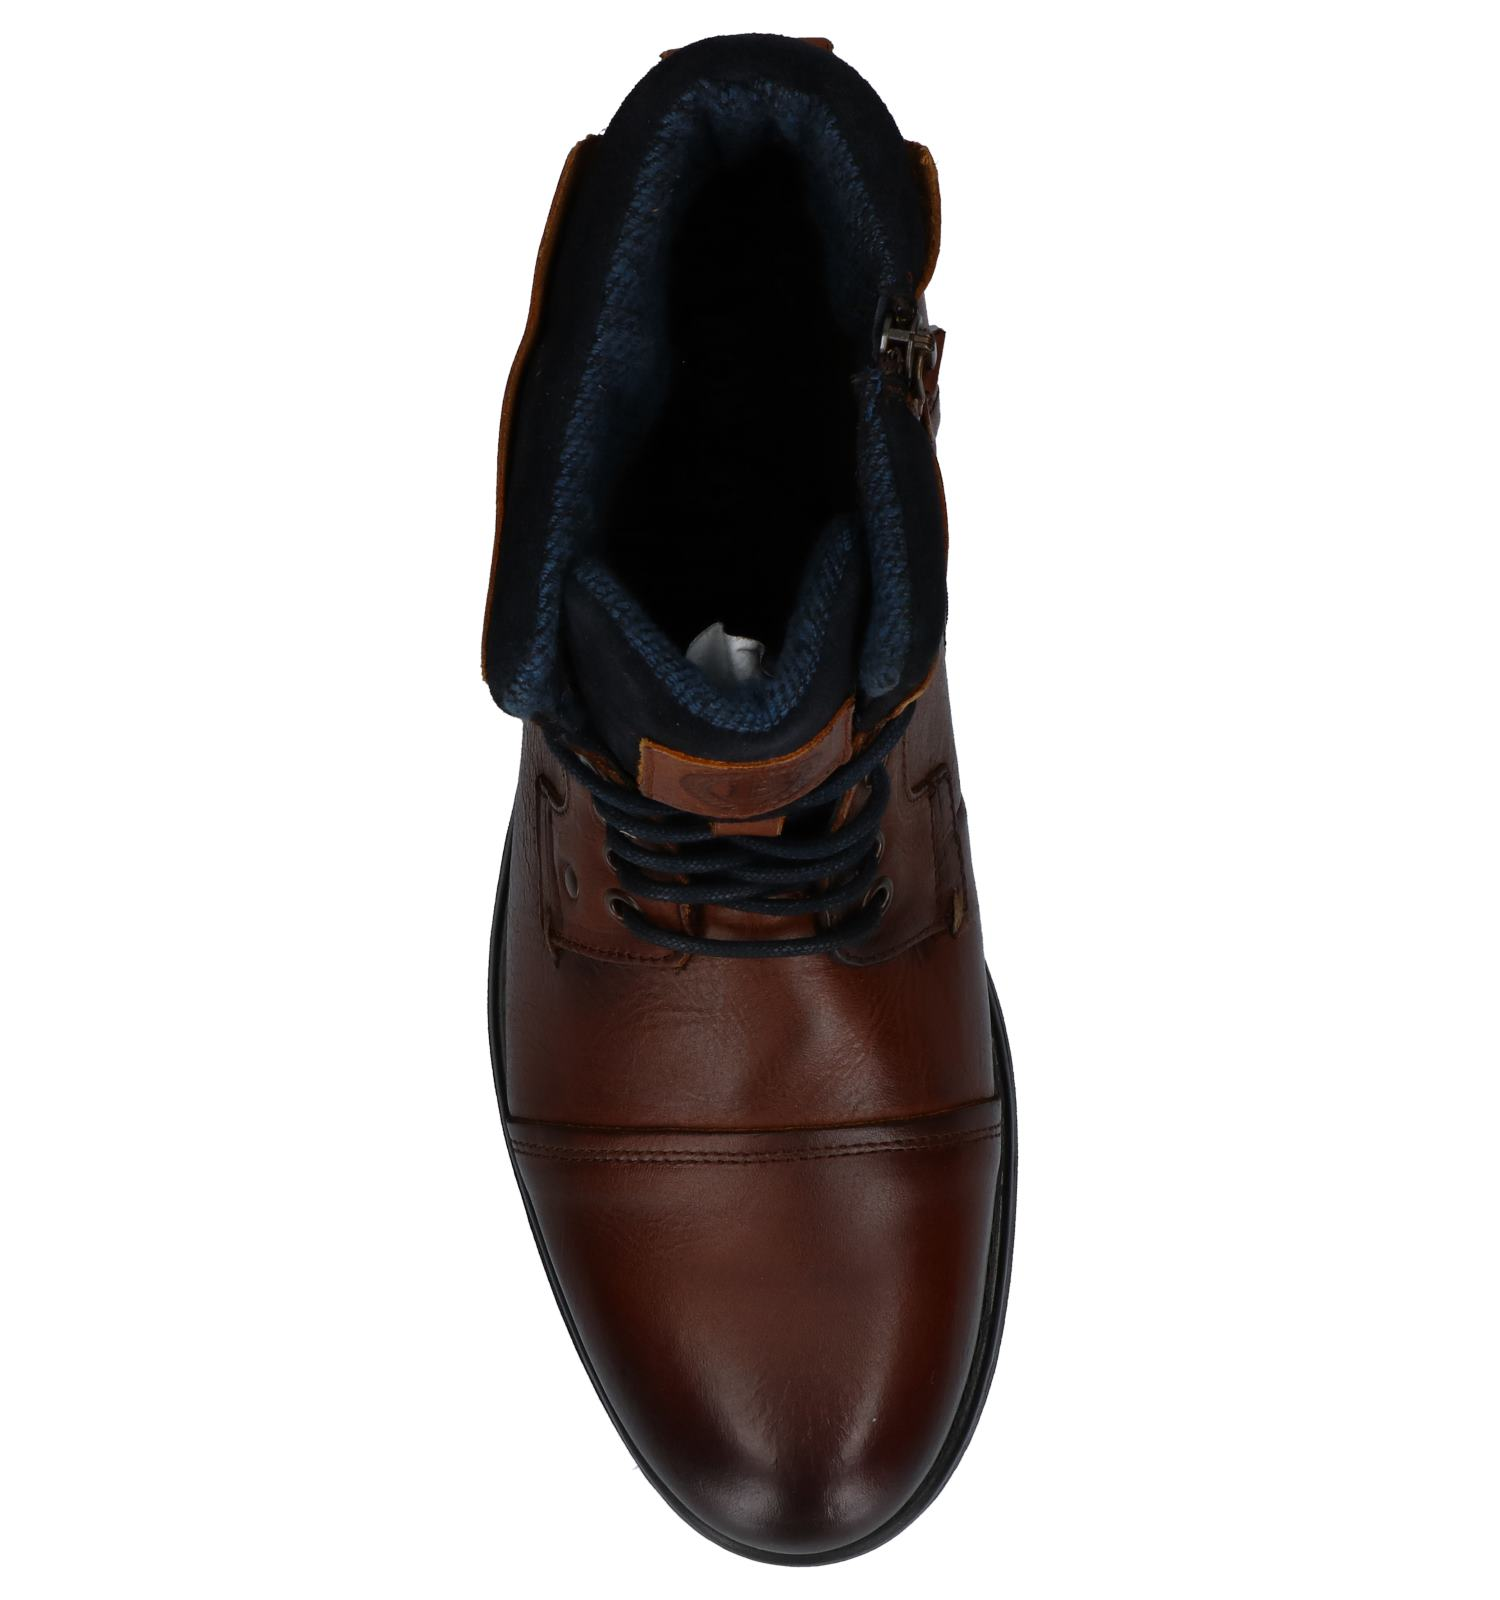 Geklede Ritsveter Boots Cognac Met be Sport Torfs Borgo Agoz ftgdwzqxdR